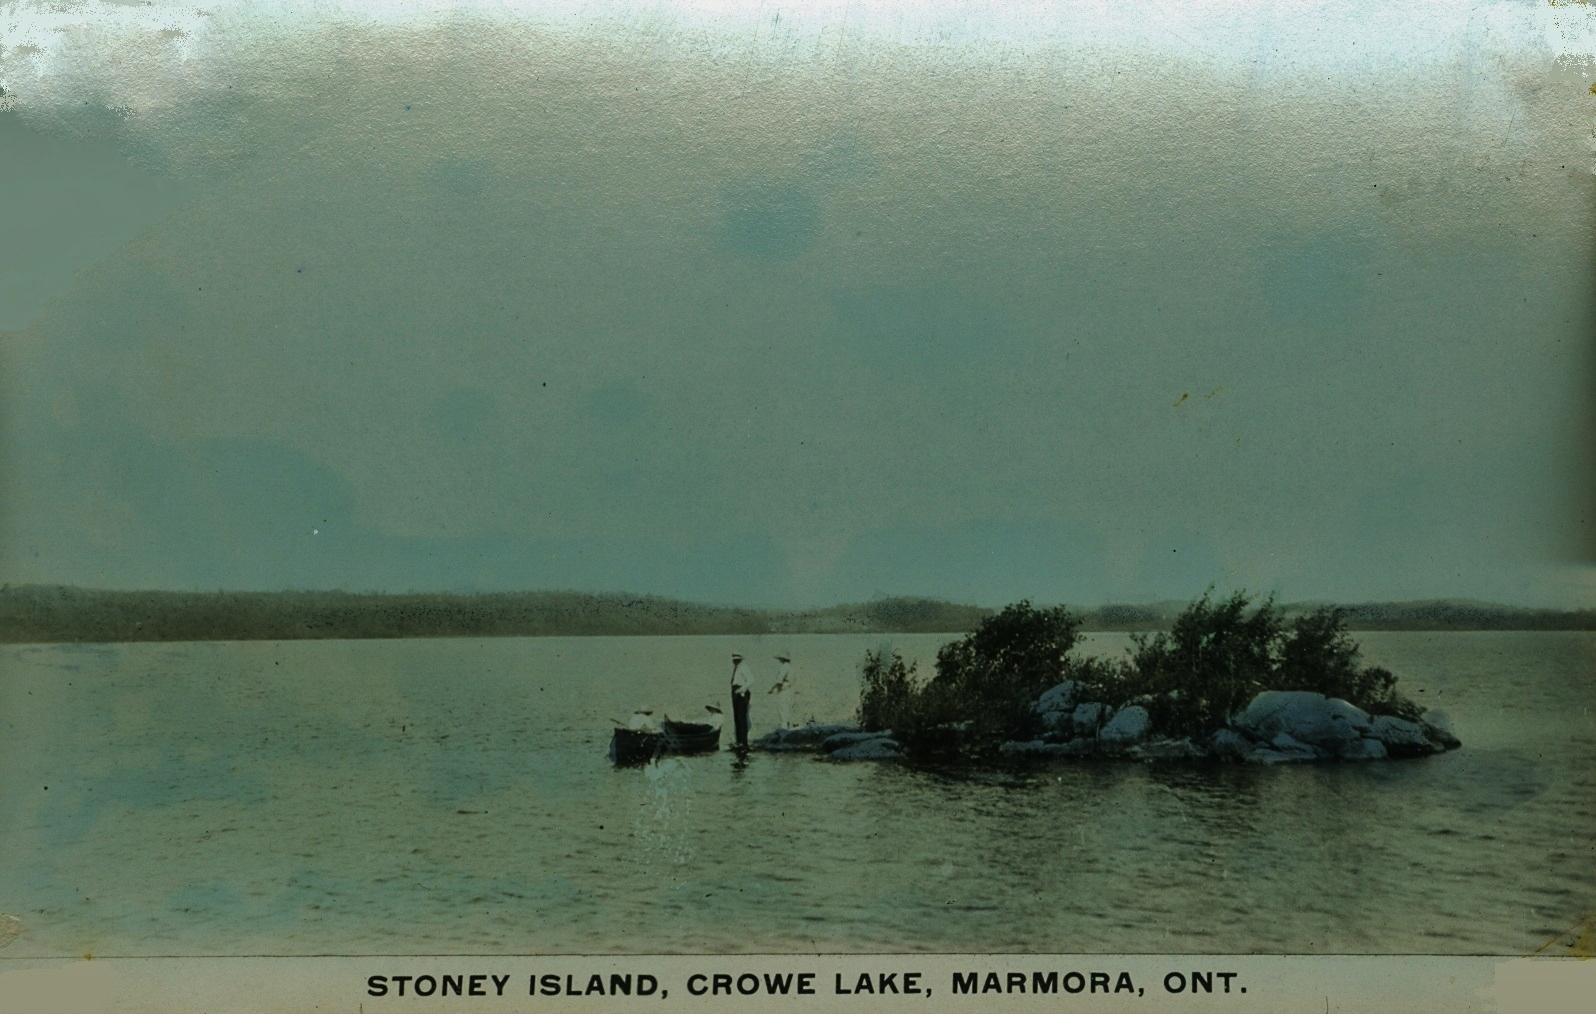 Stoney Island, Crowe Lake, Marmora,  1936.jpg